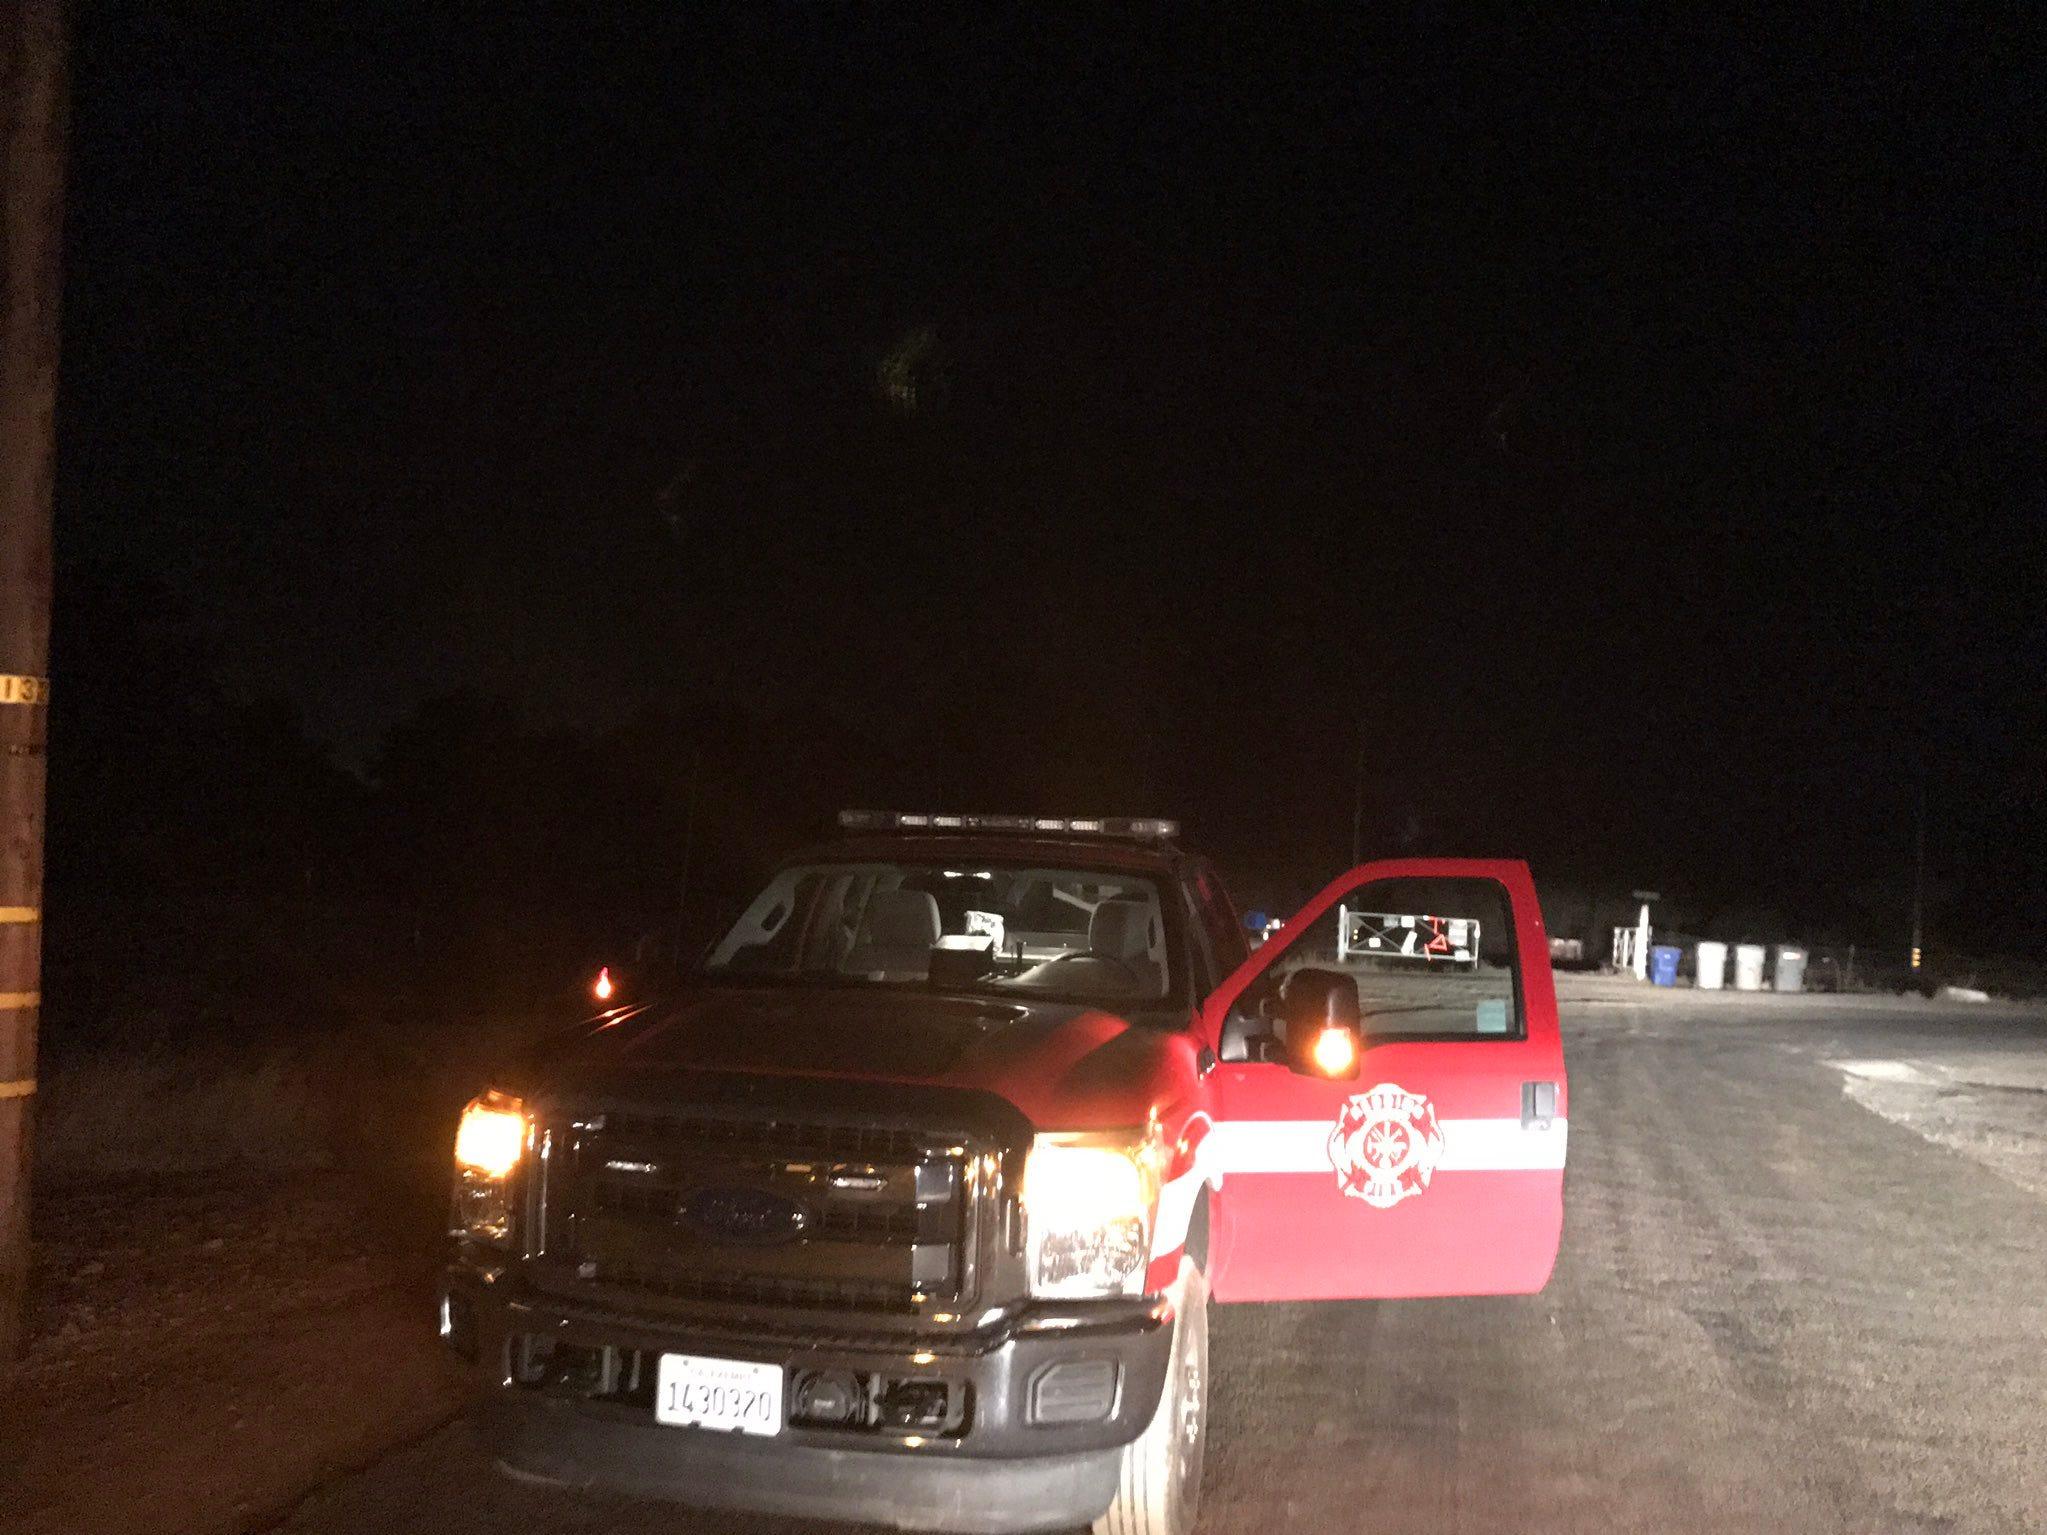 Sacramento area pair killed in Angel Flight plane crash in Redding identified